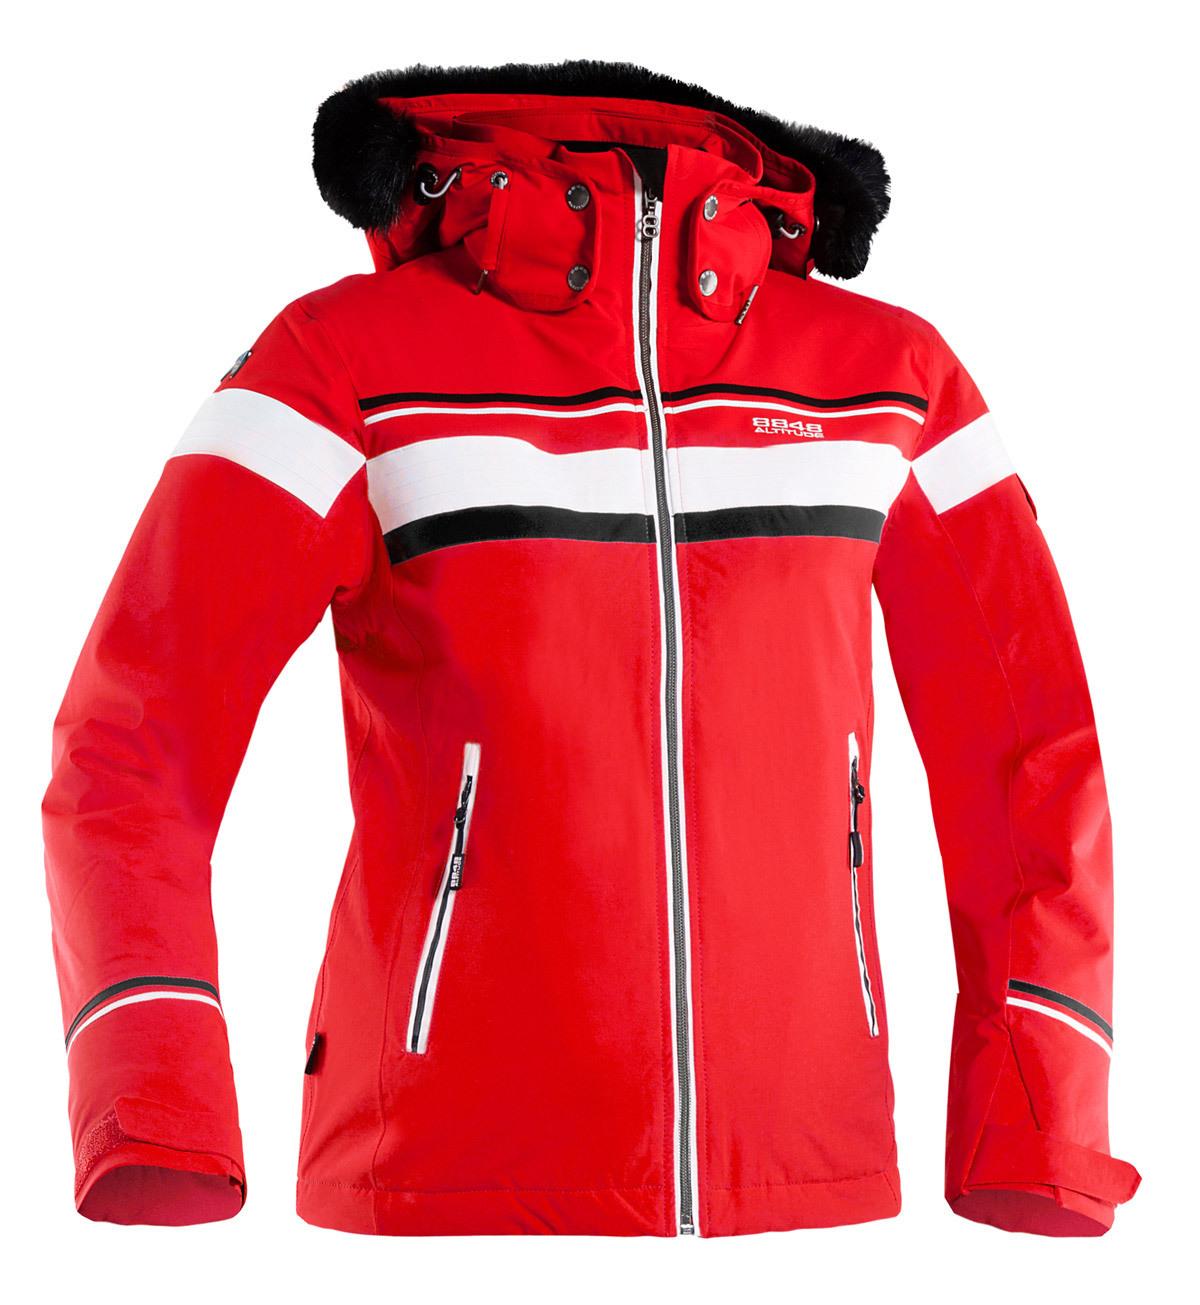 Горнолыжная куртка 8848 Altitude Carlin красная